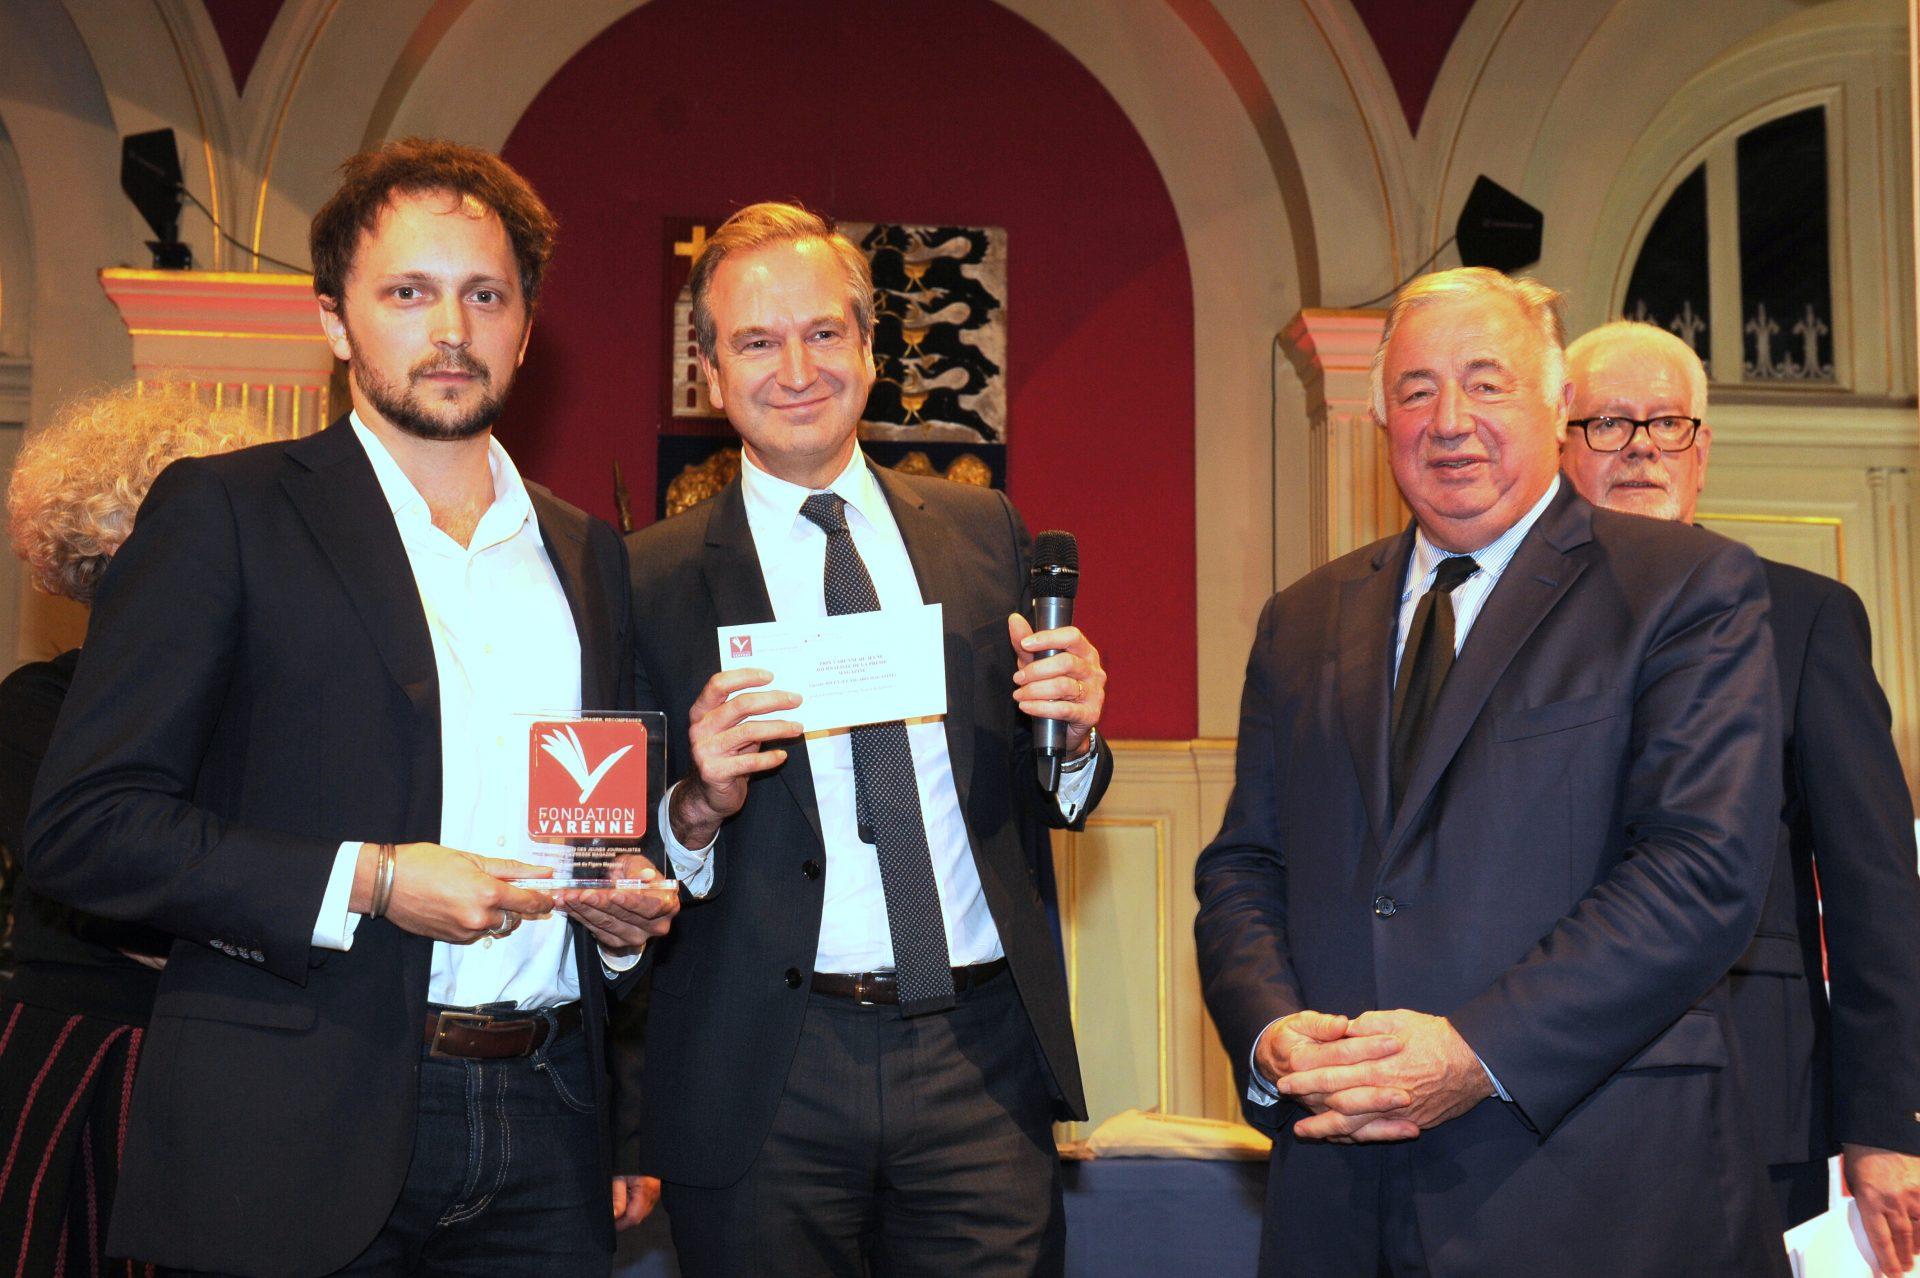 Prix VARENNE du Jeune Journaliste Presse Magazine remis à Vincent JOLLY du FIGARO.